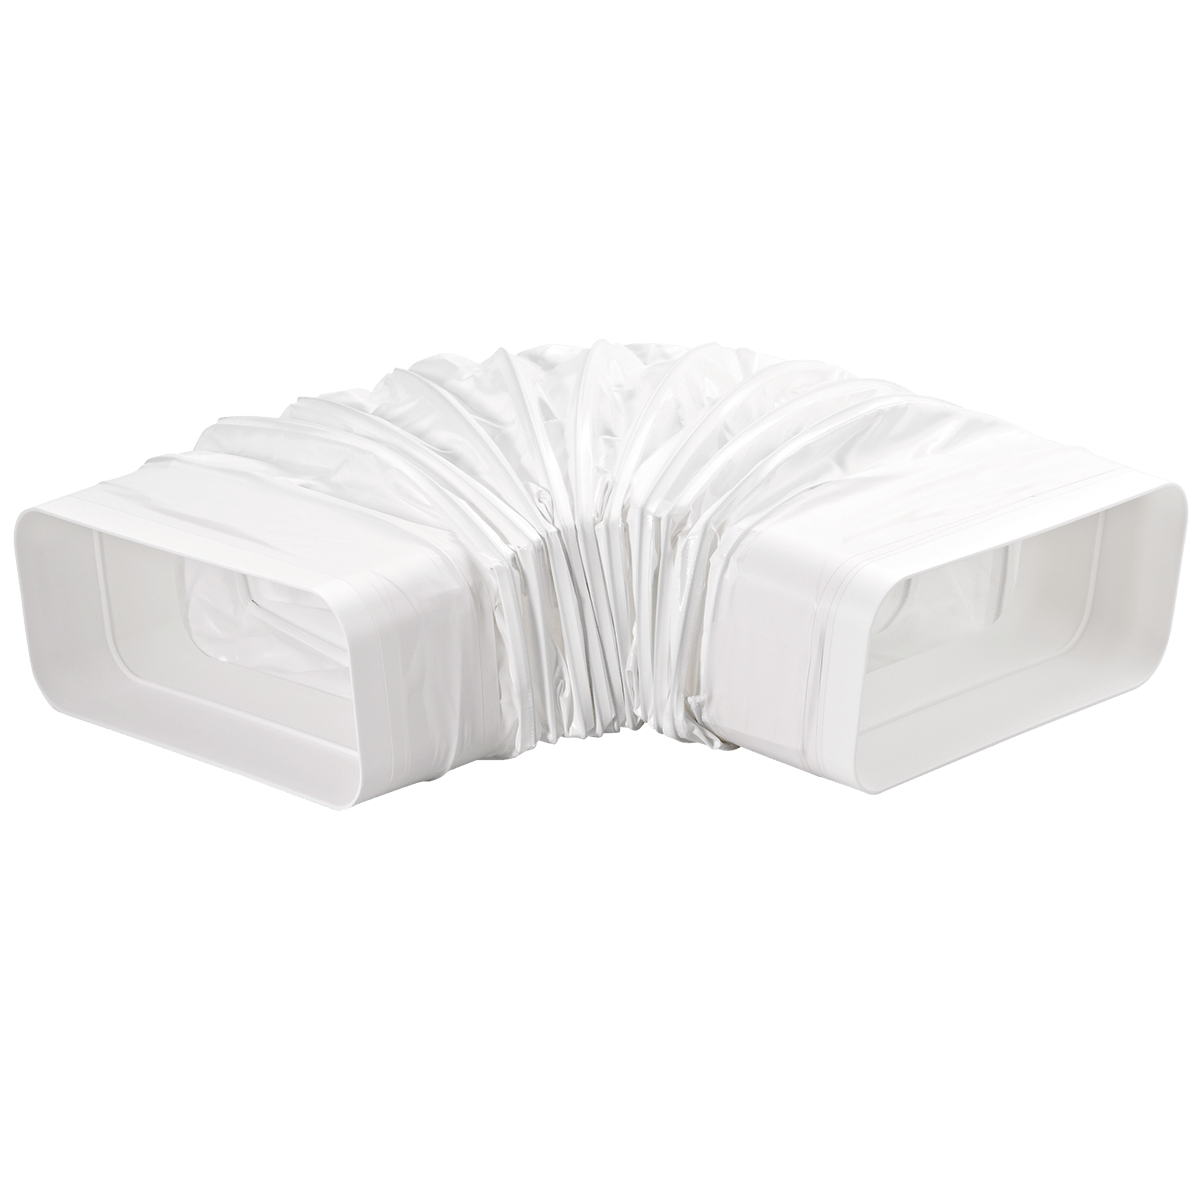 Naber tubage plat flexible jusqu'a 90°